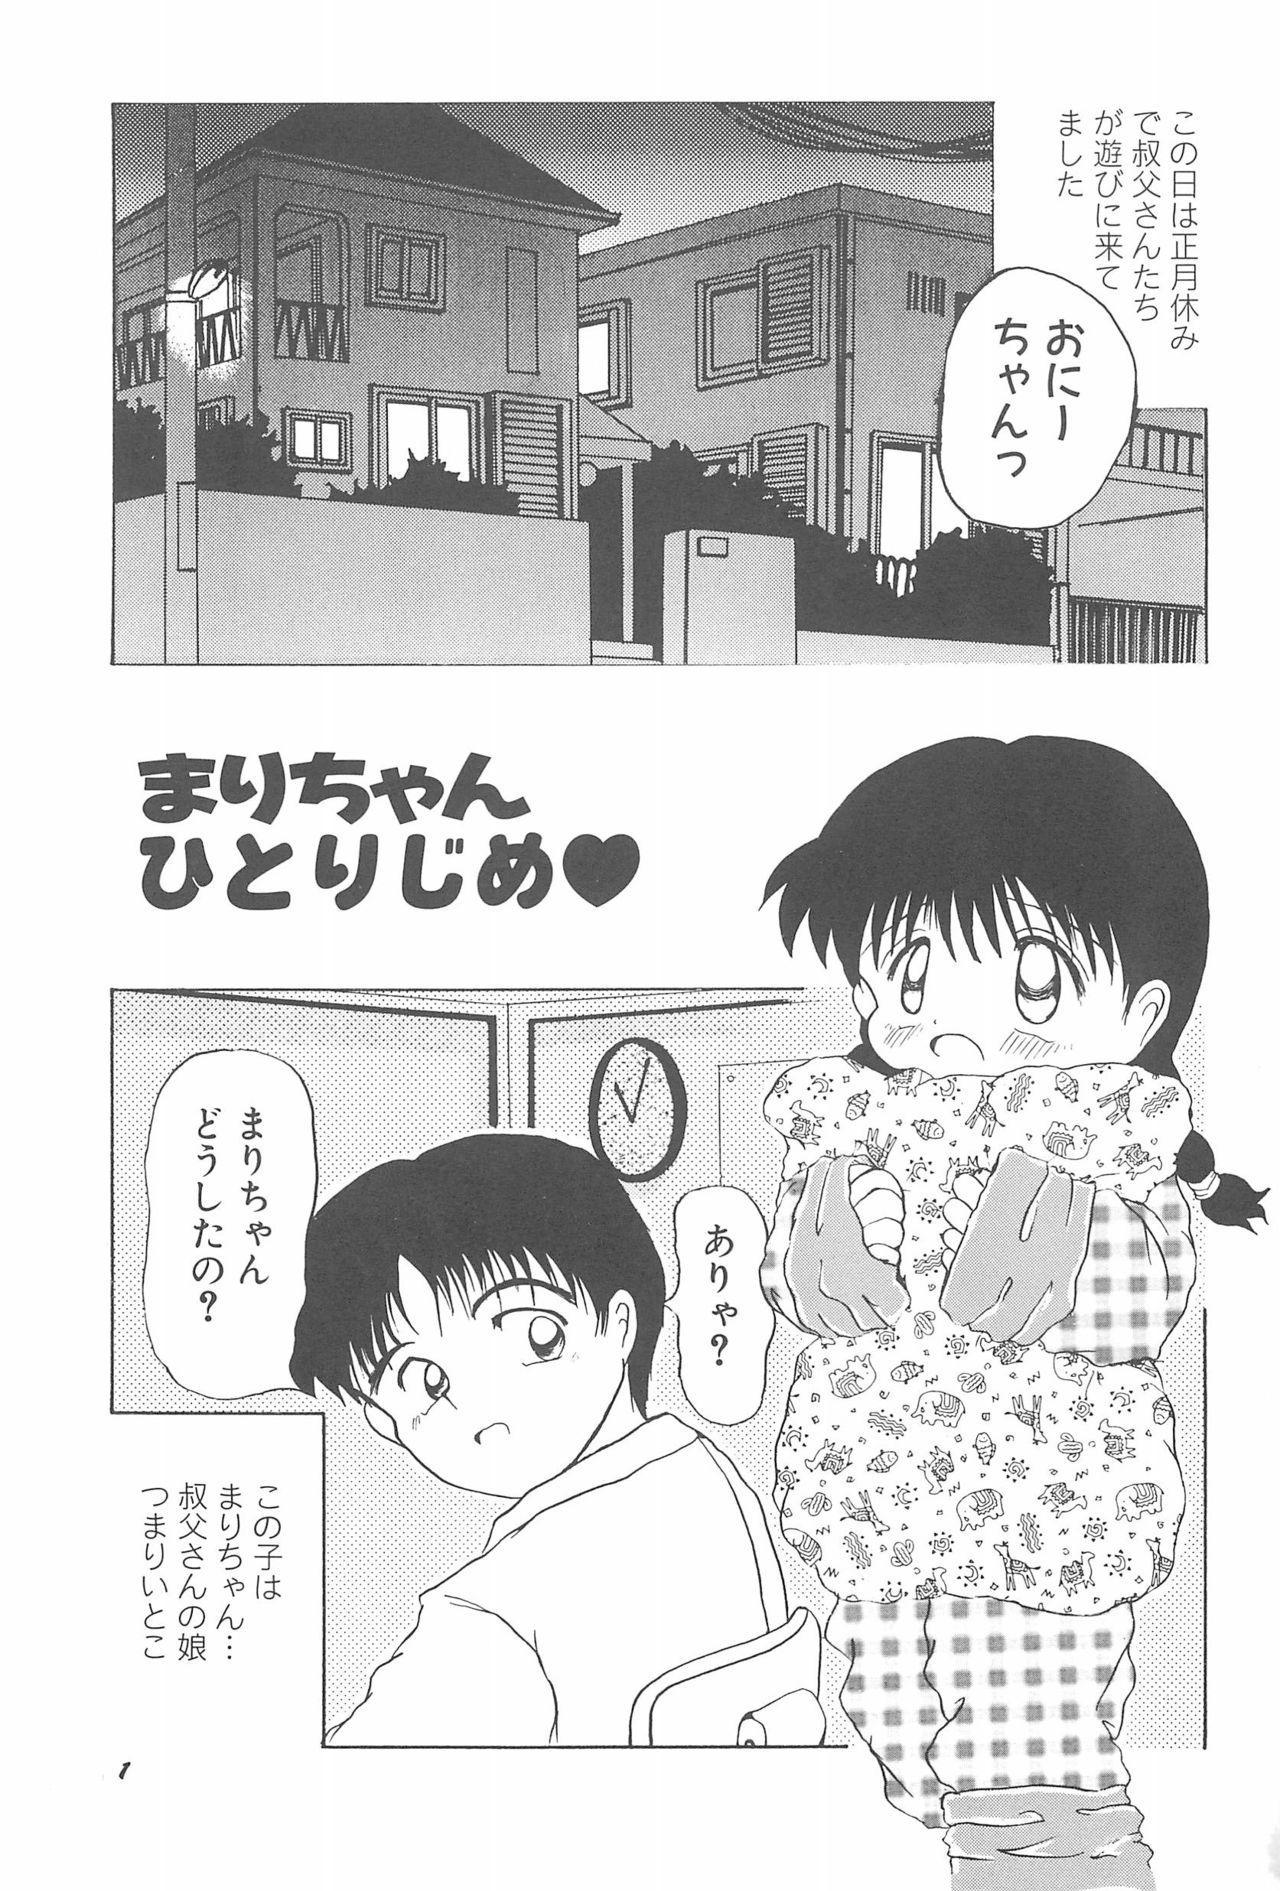 Aoi Shojokyuu 6